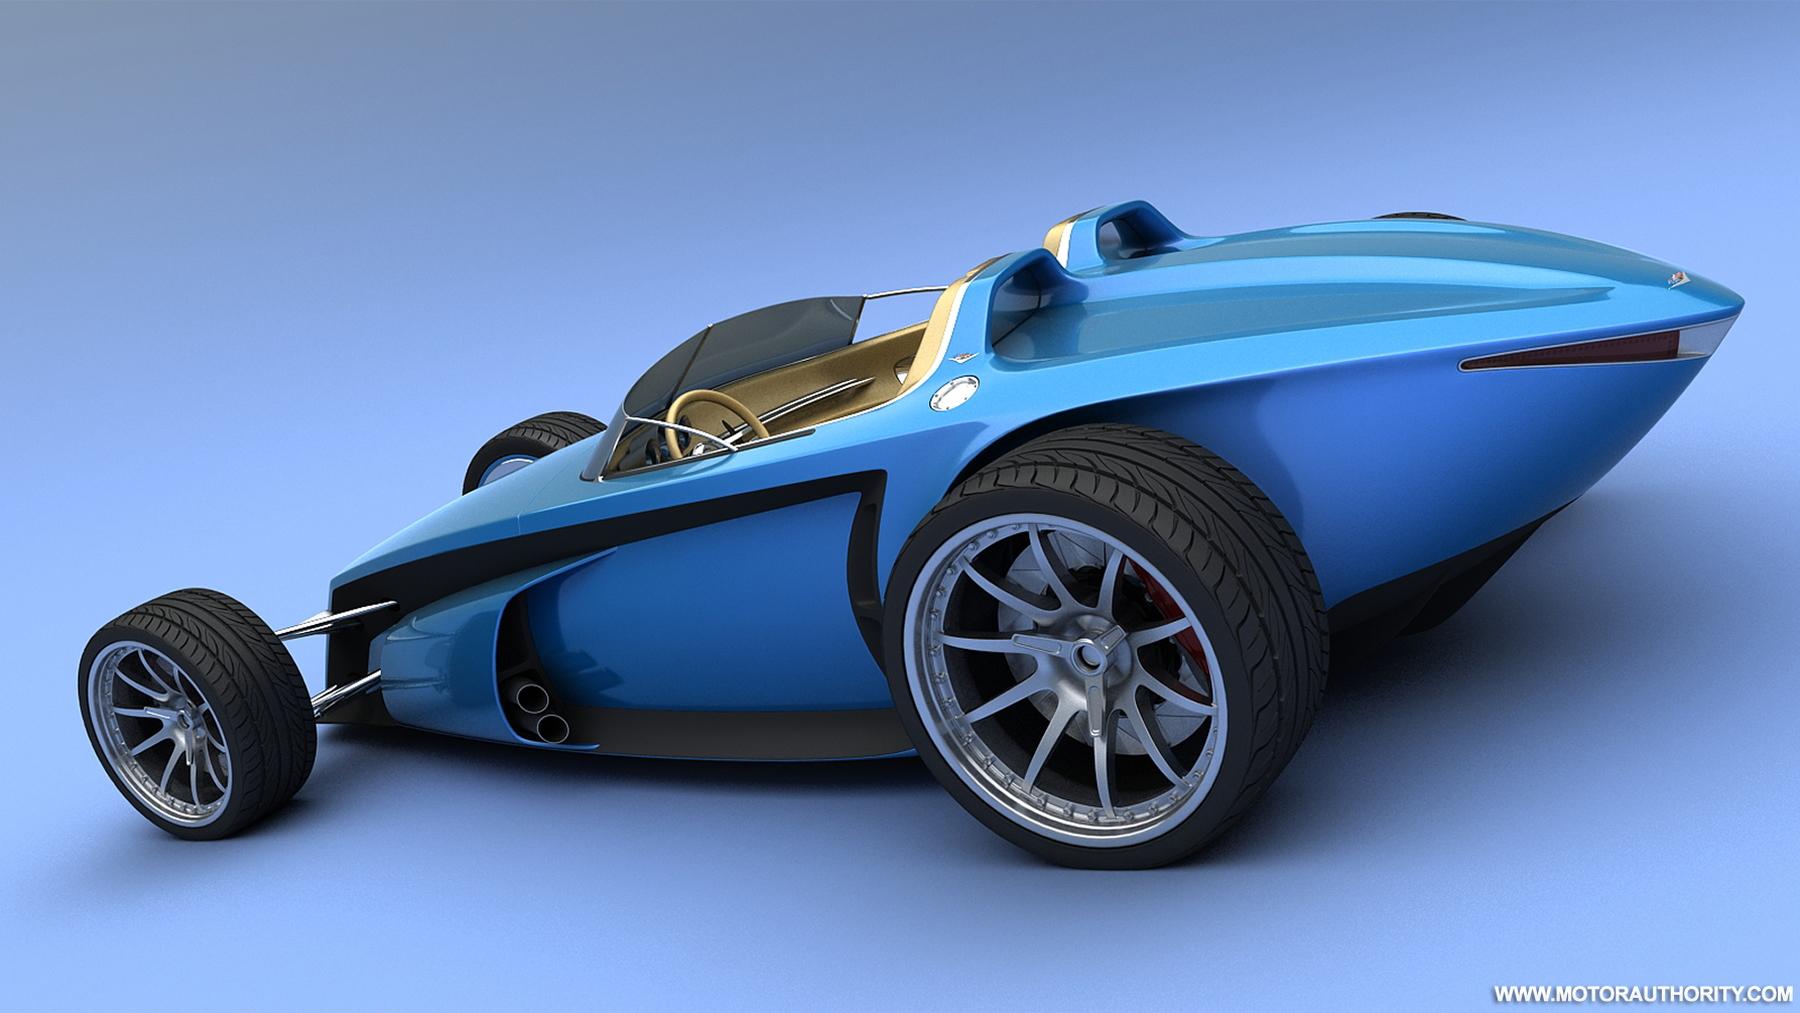 vizualtech super hotrod rendering 007